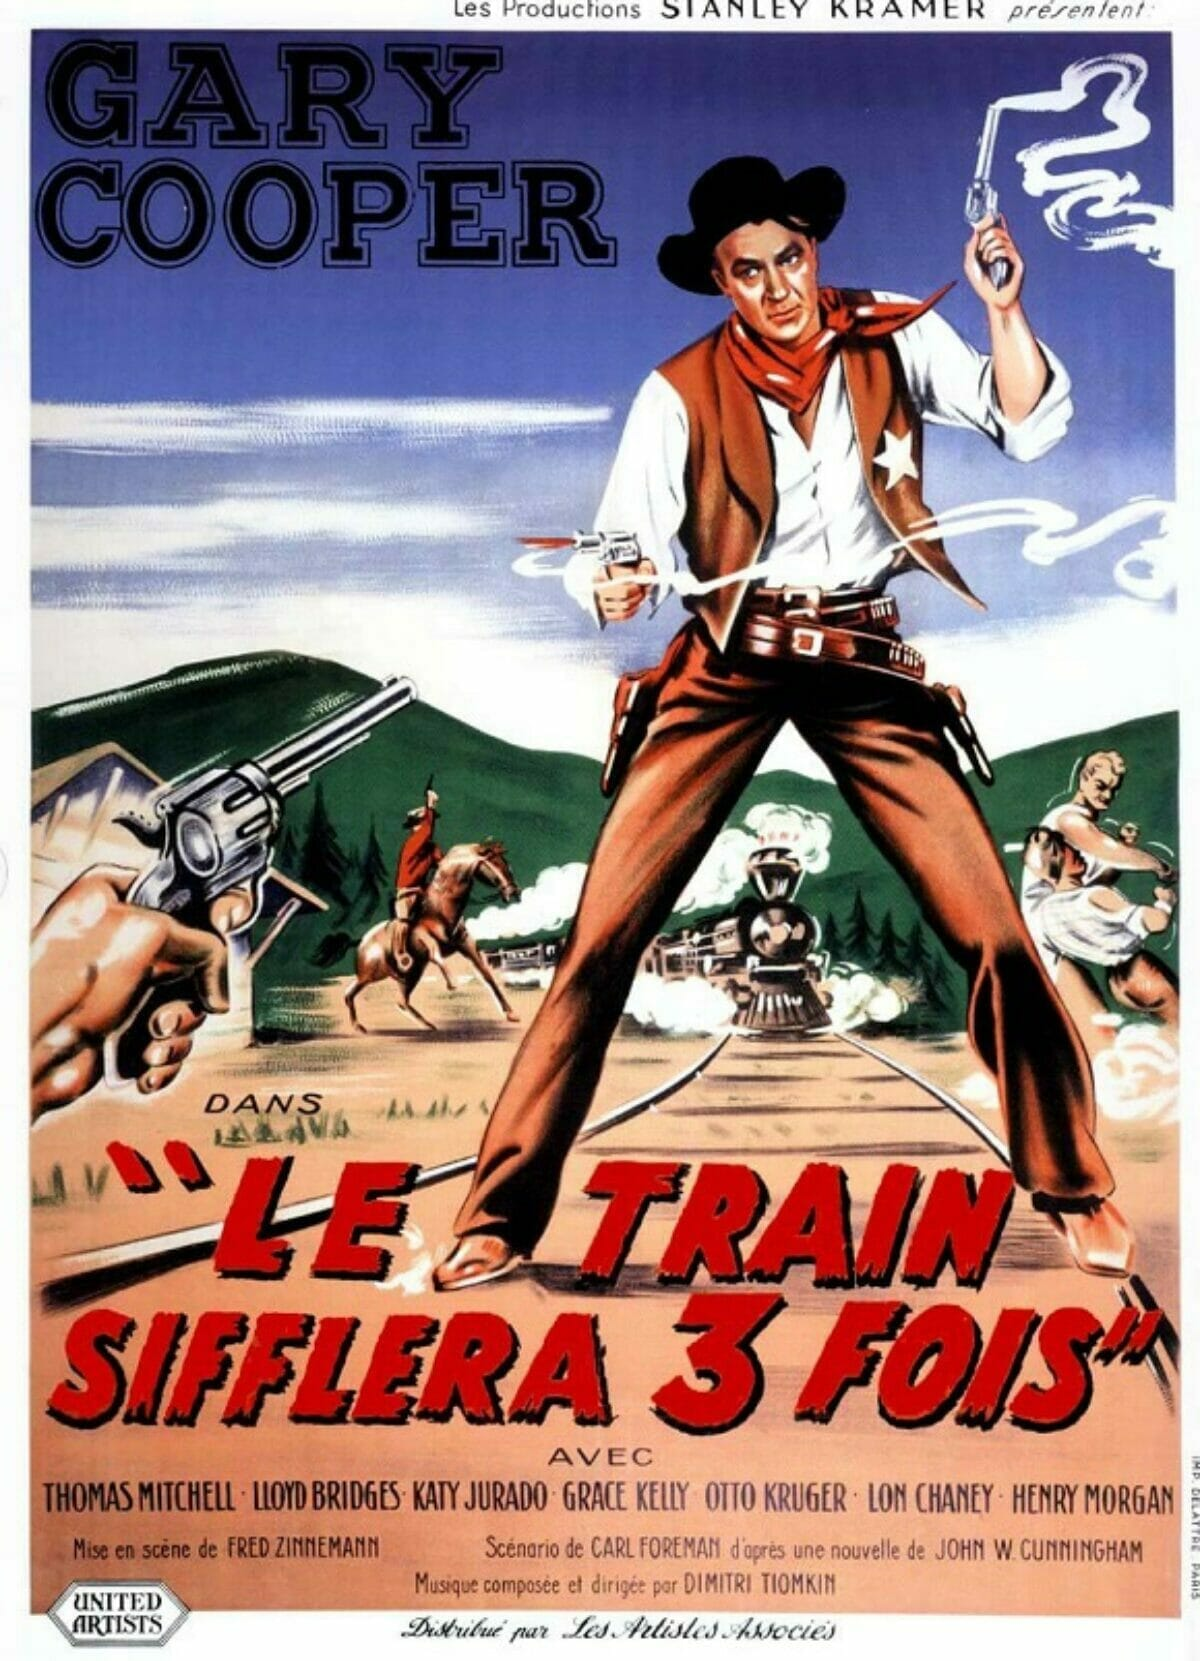 Le-train-sifflera-trois-fois-poster